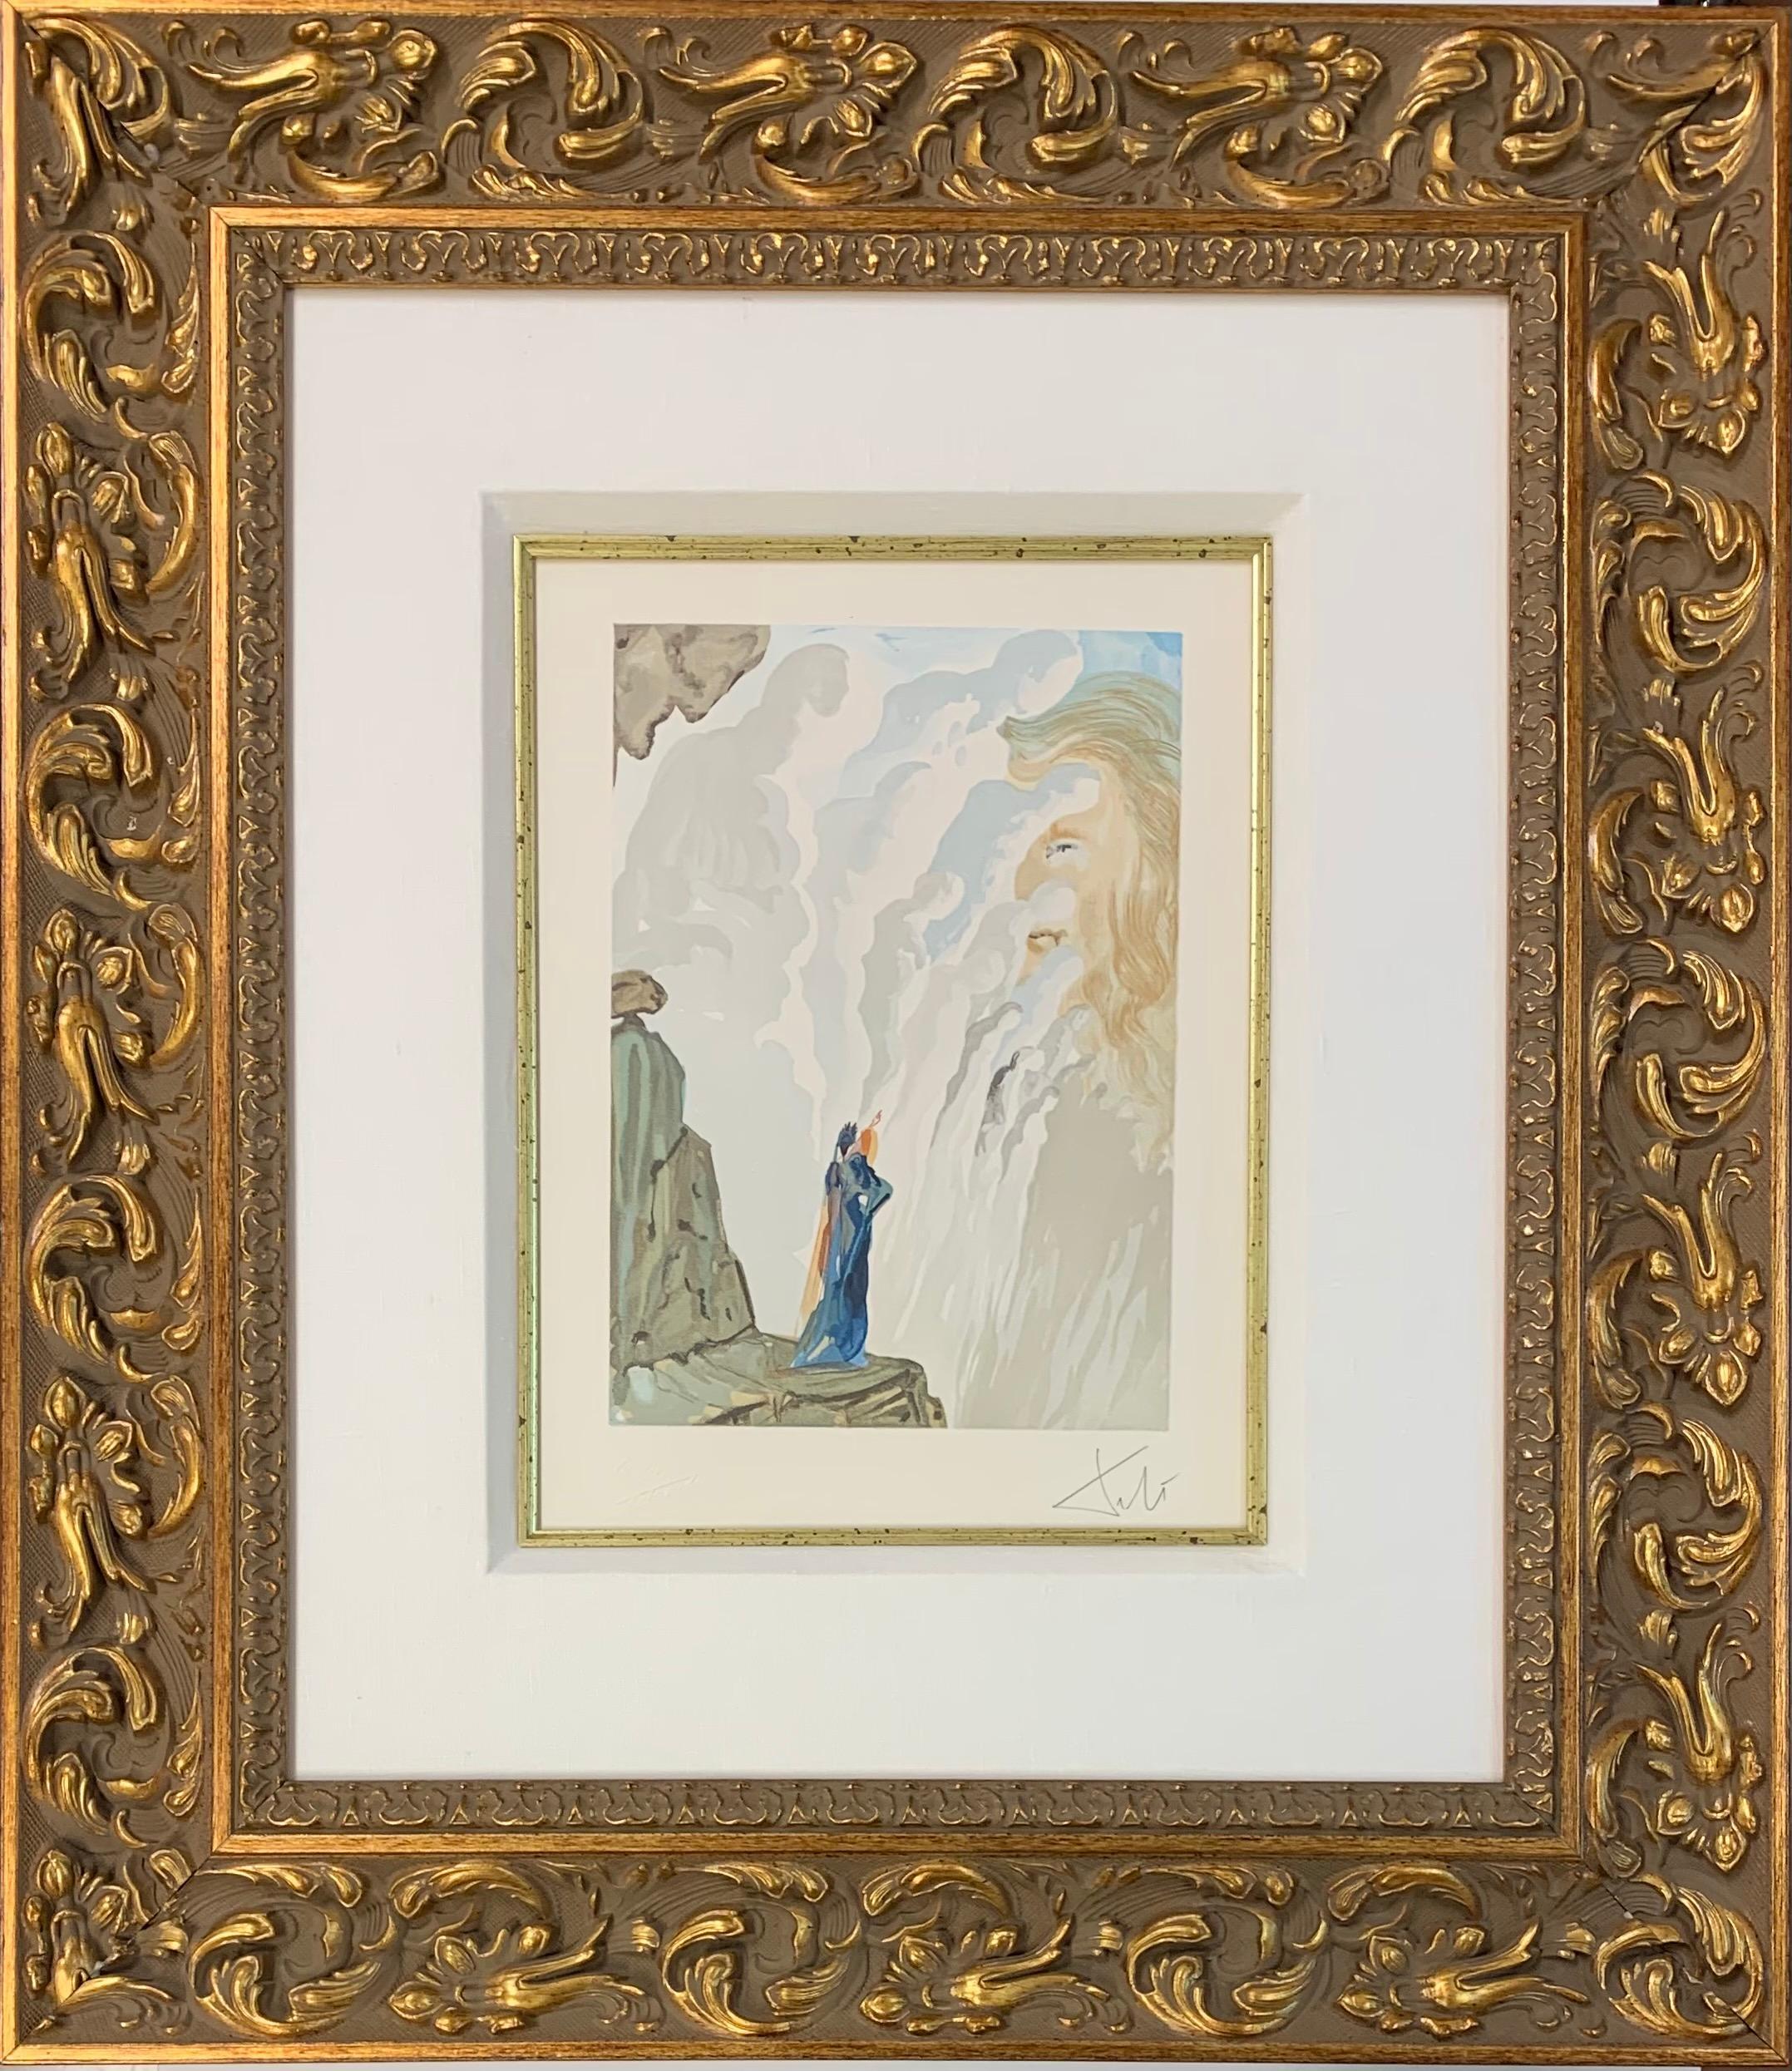 Divine Comedy Purgatory Canto #17, Original Surrealist Woodcut Print